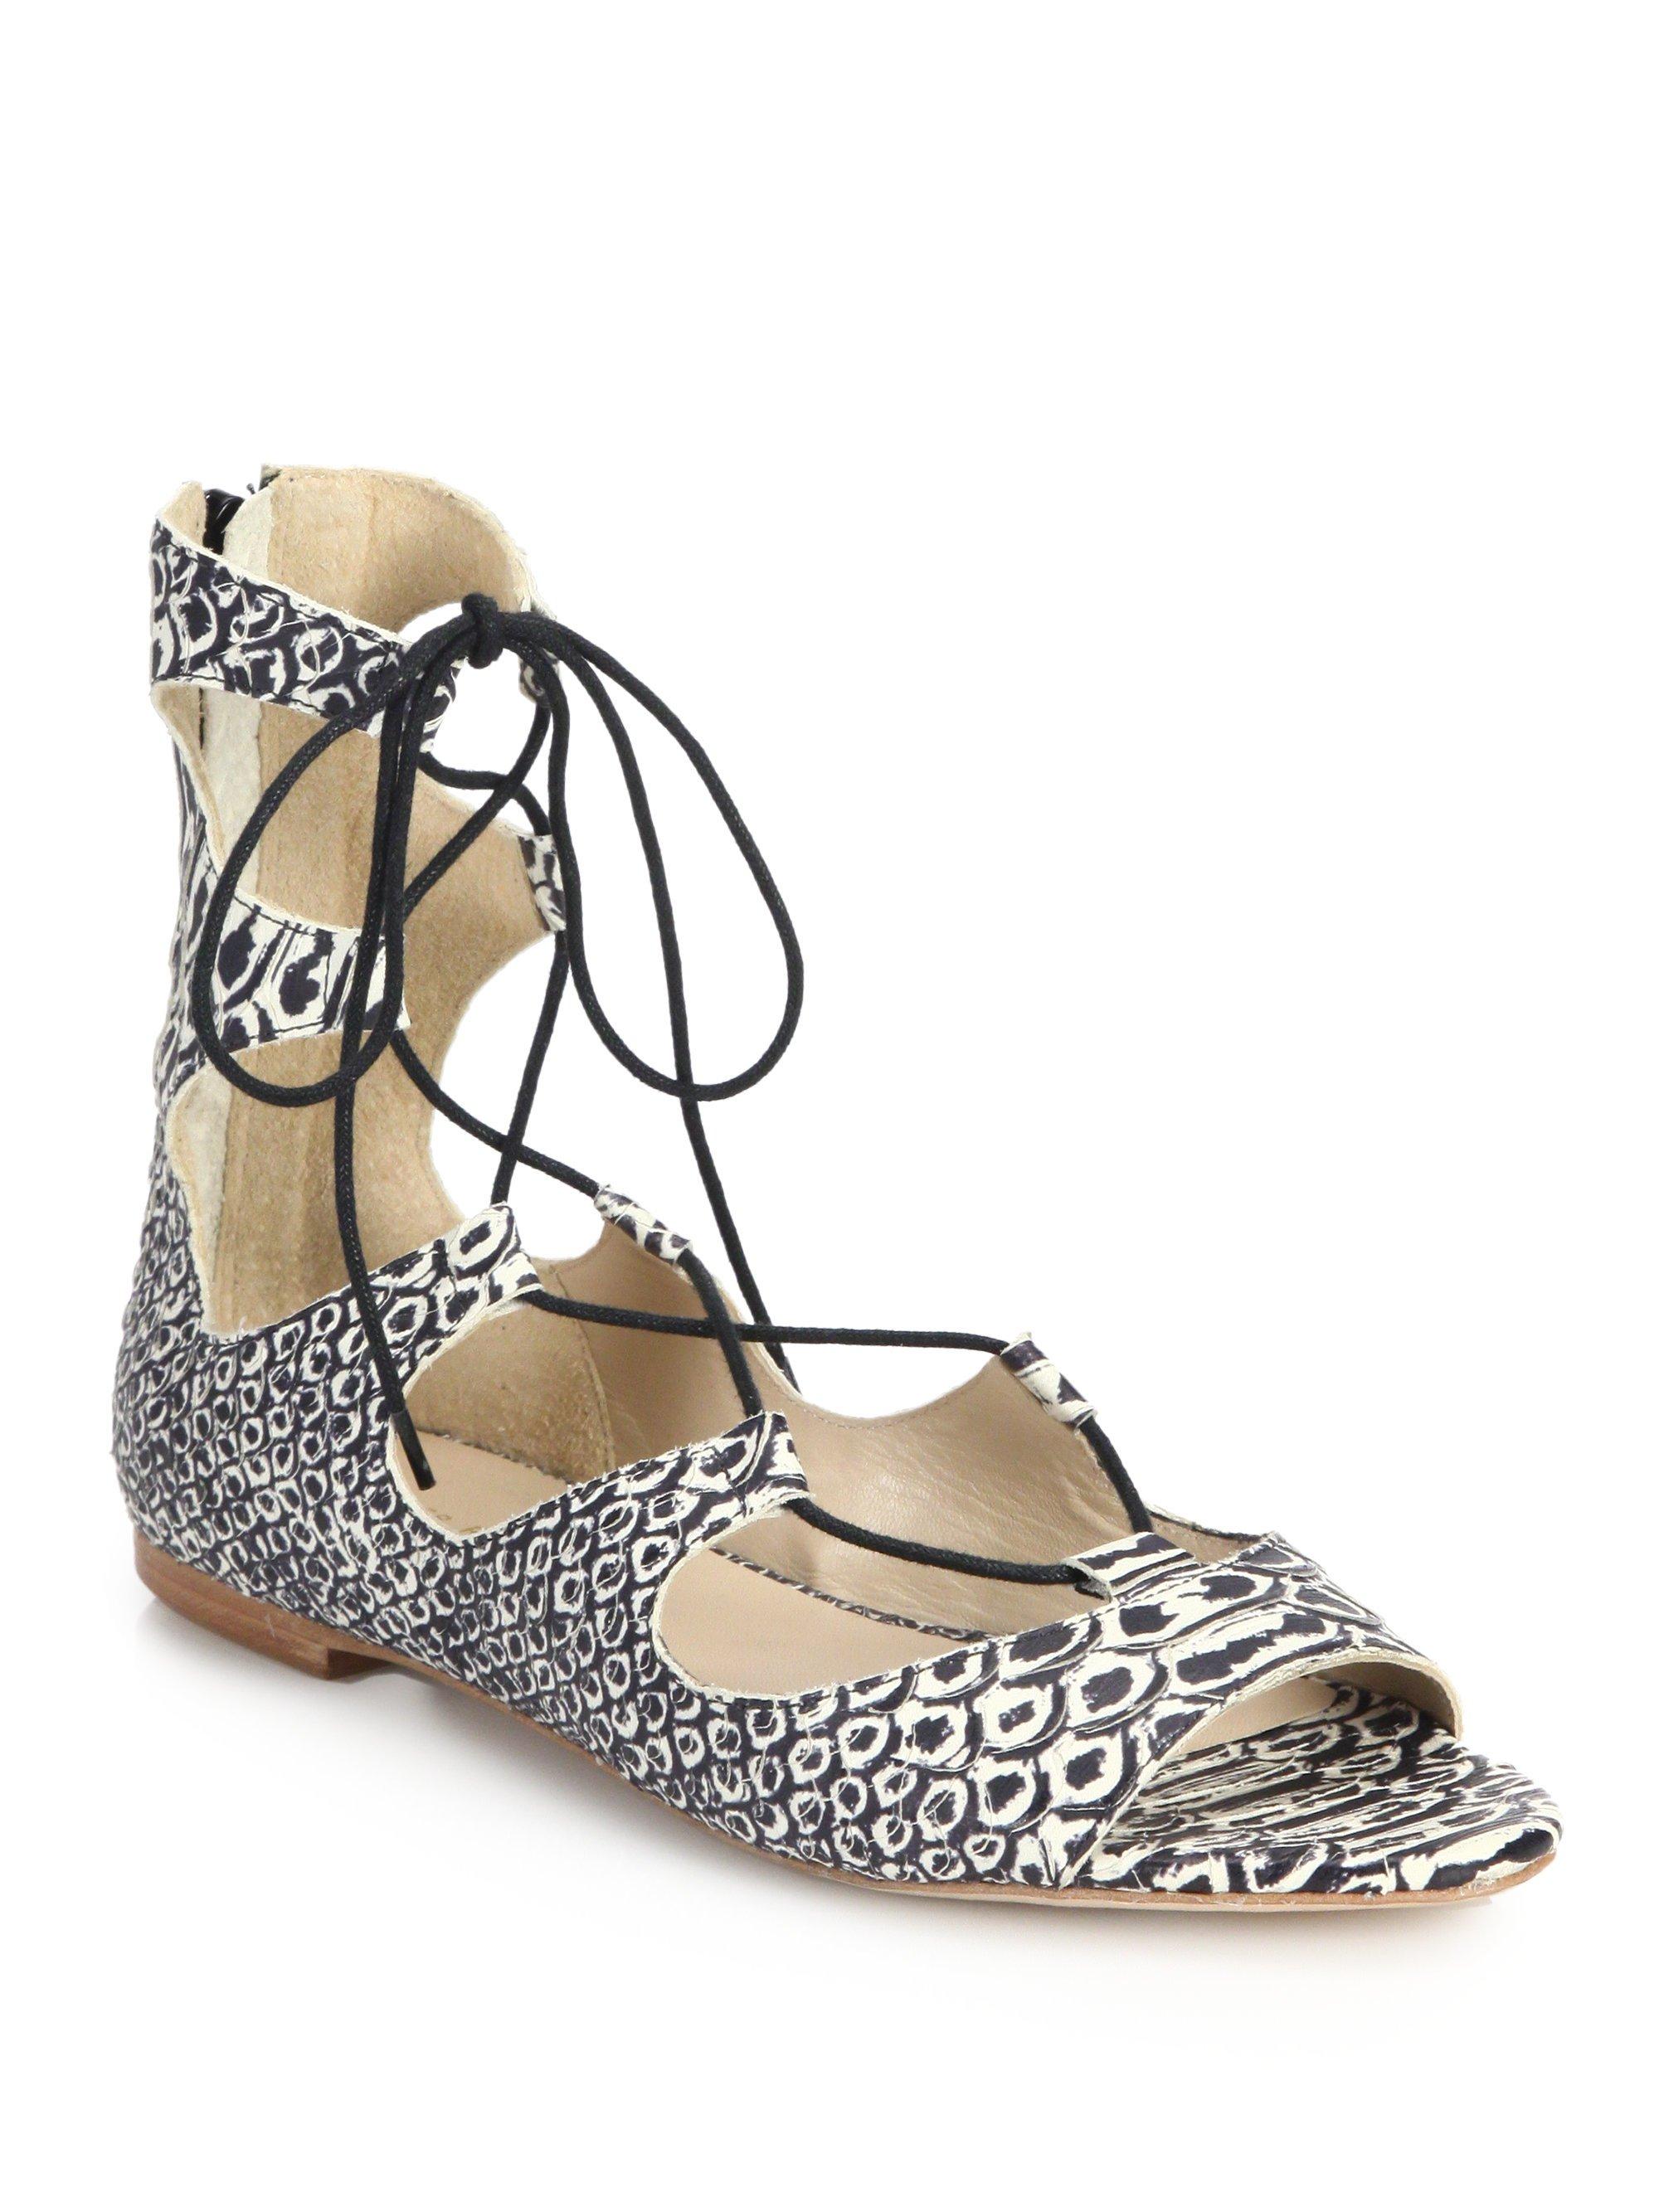 Loeffler Randall Embossed Leather Platform Sandals tumblr Jcqnl3yj